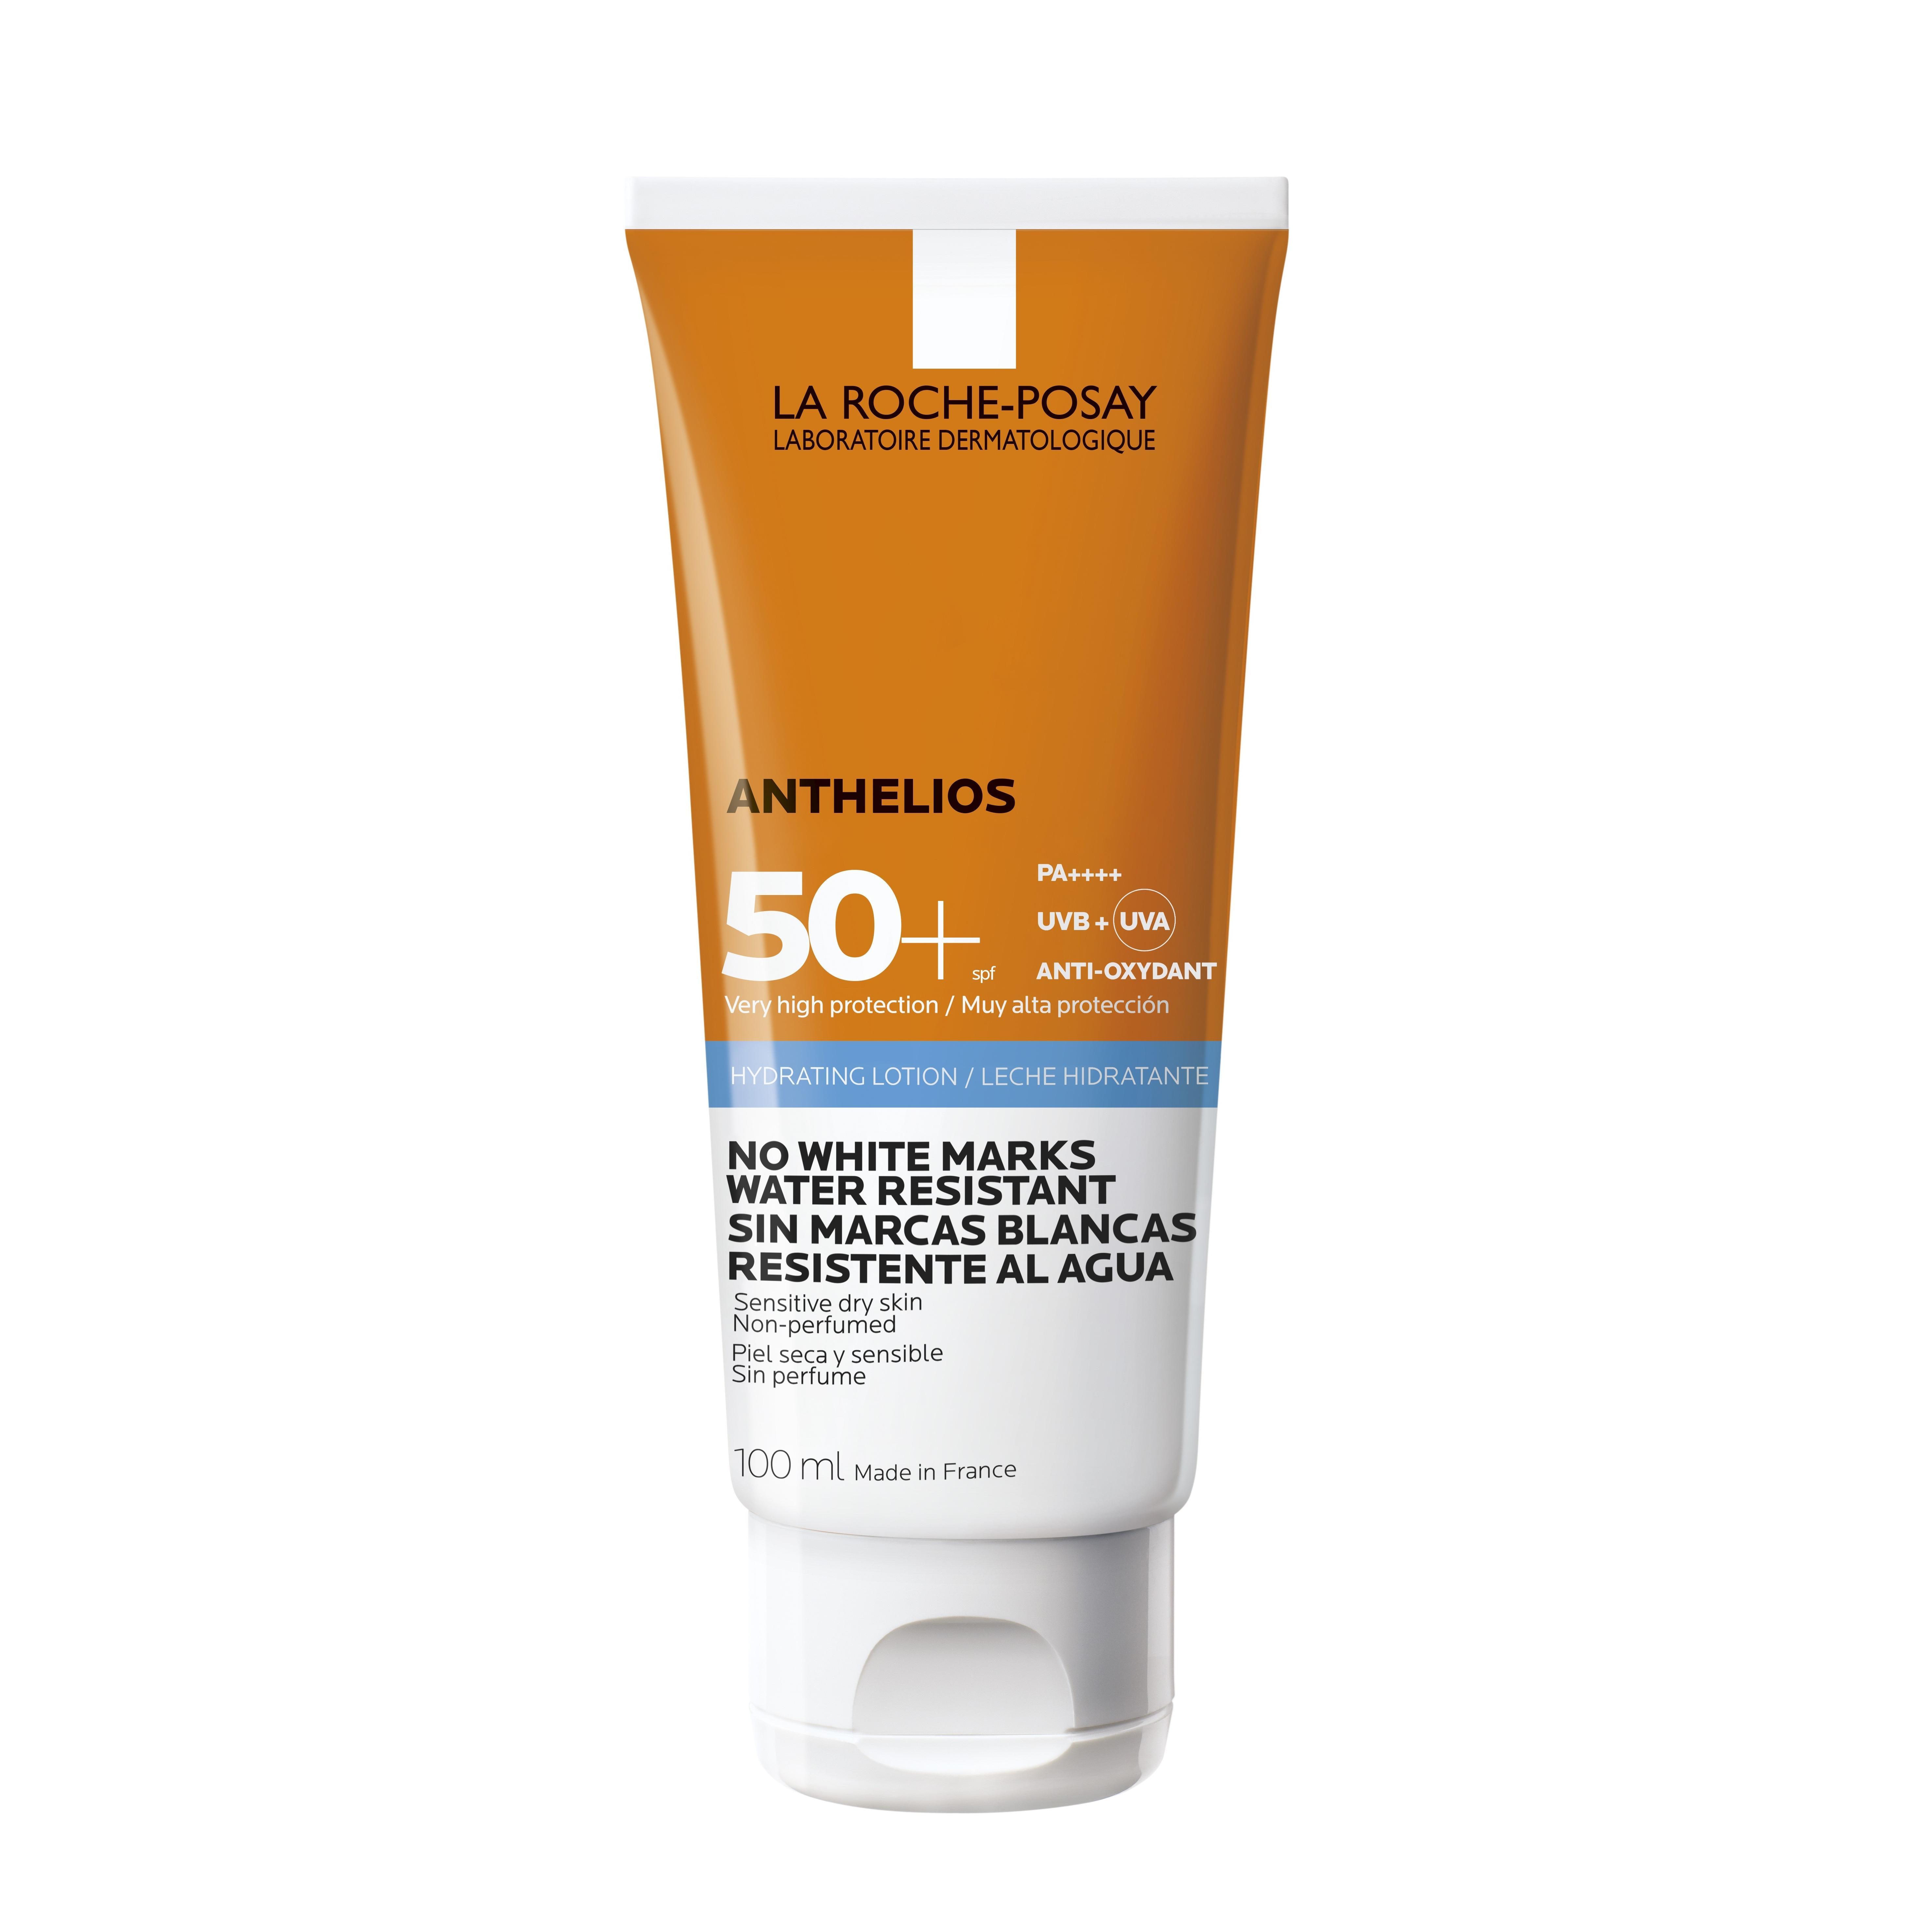 Image of La Roche-Posay Anthelios Confort XL melk SPF50+